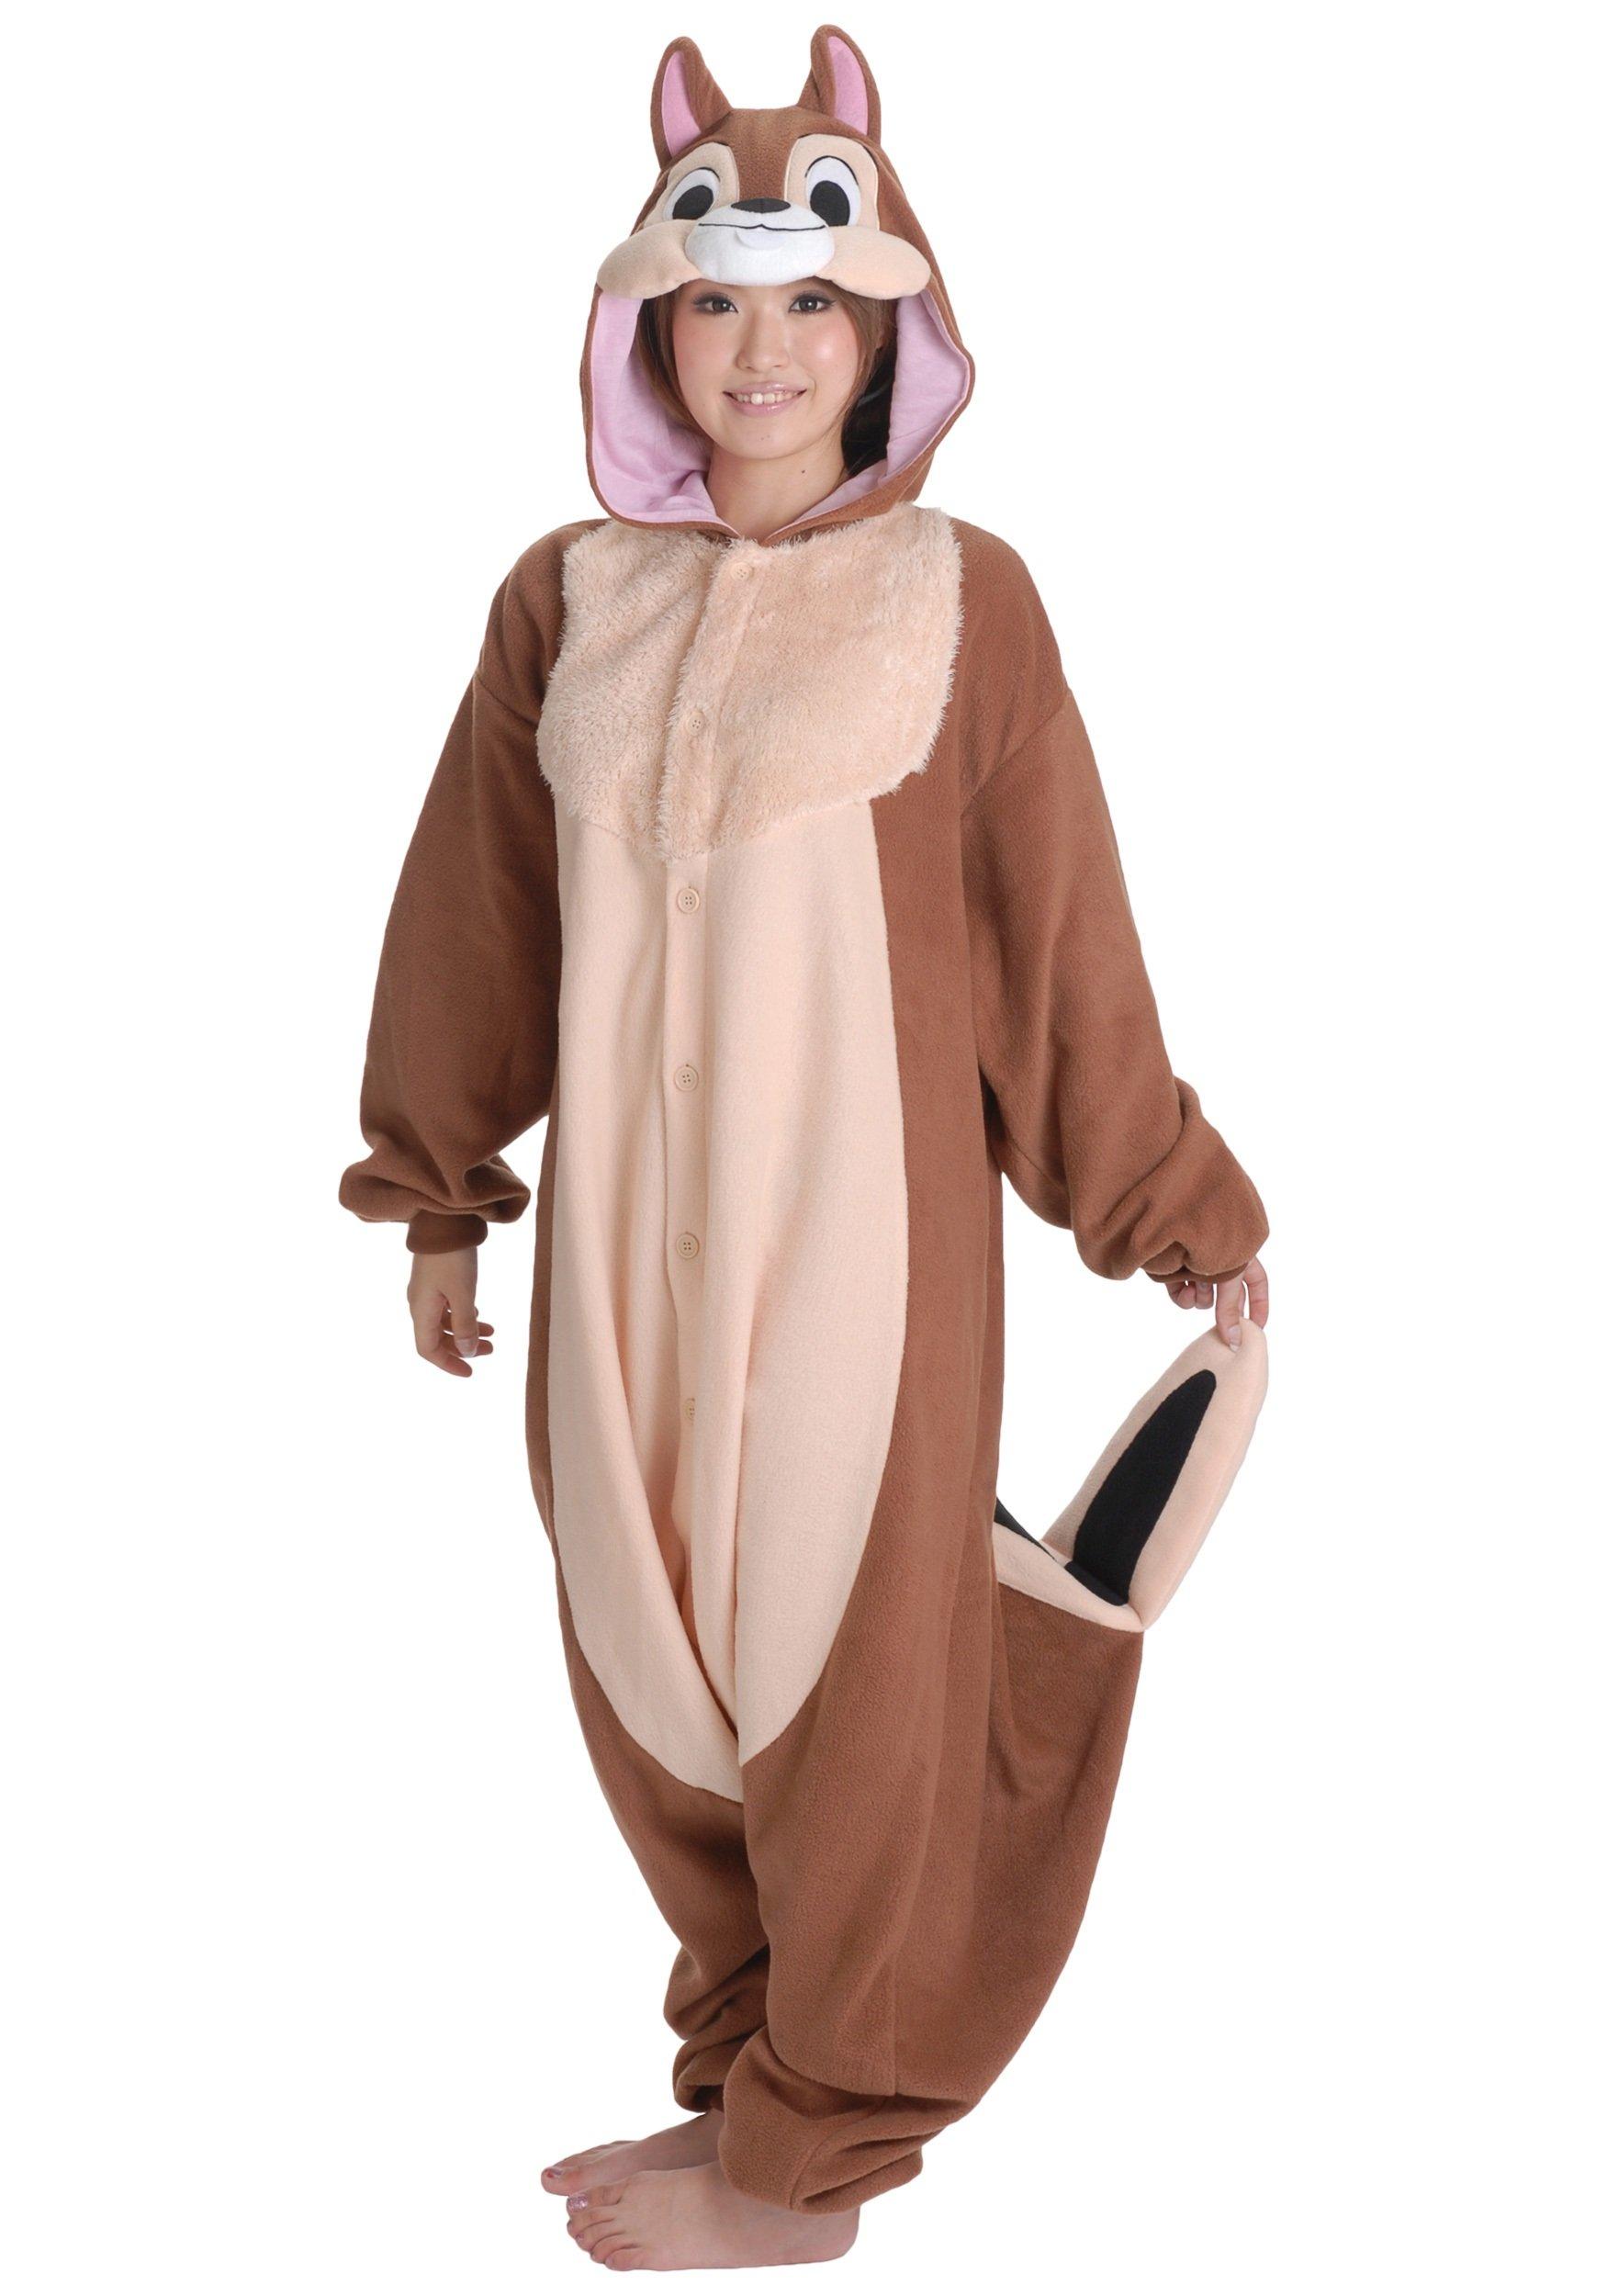 Chip Pajama Costume (Standard) Chipmunk Kigu